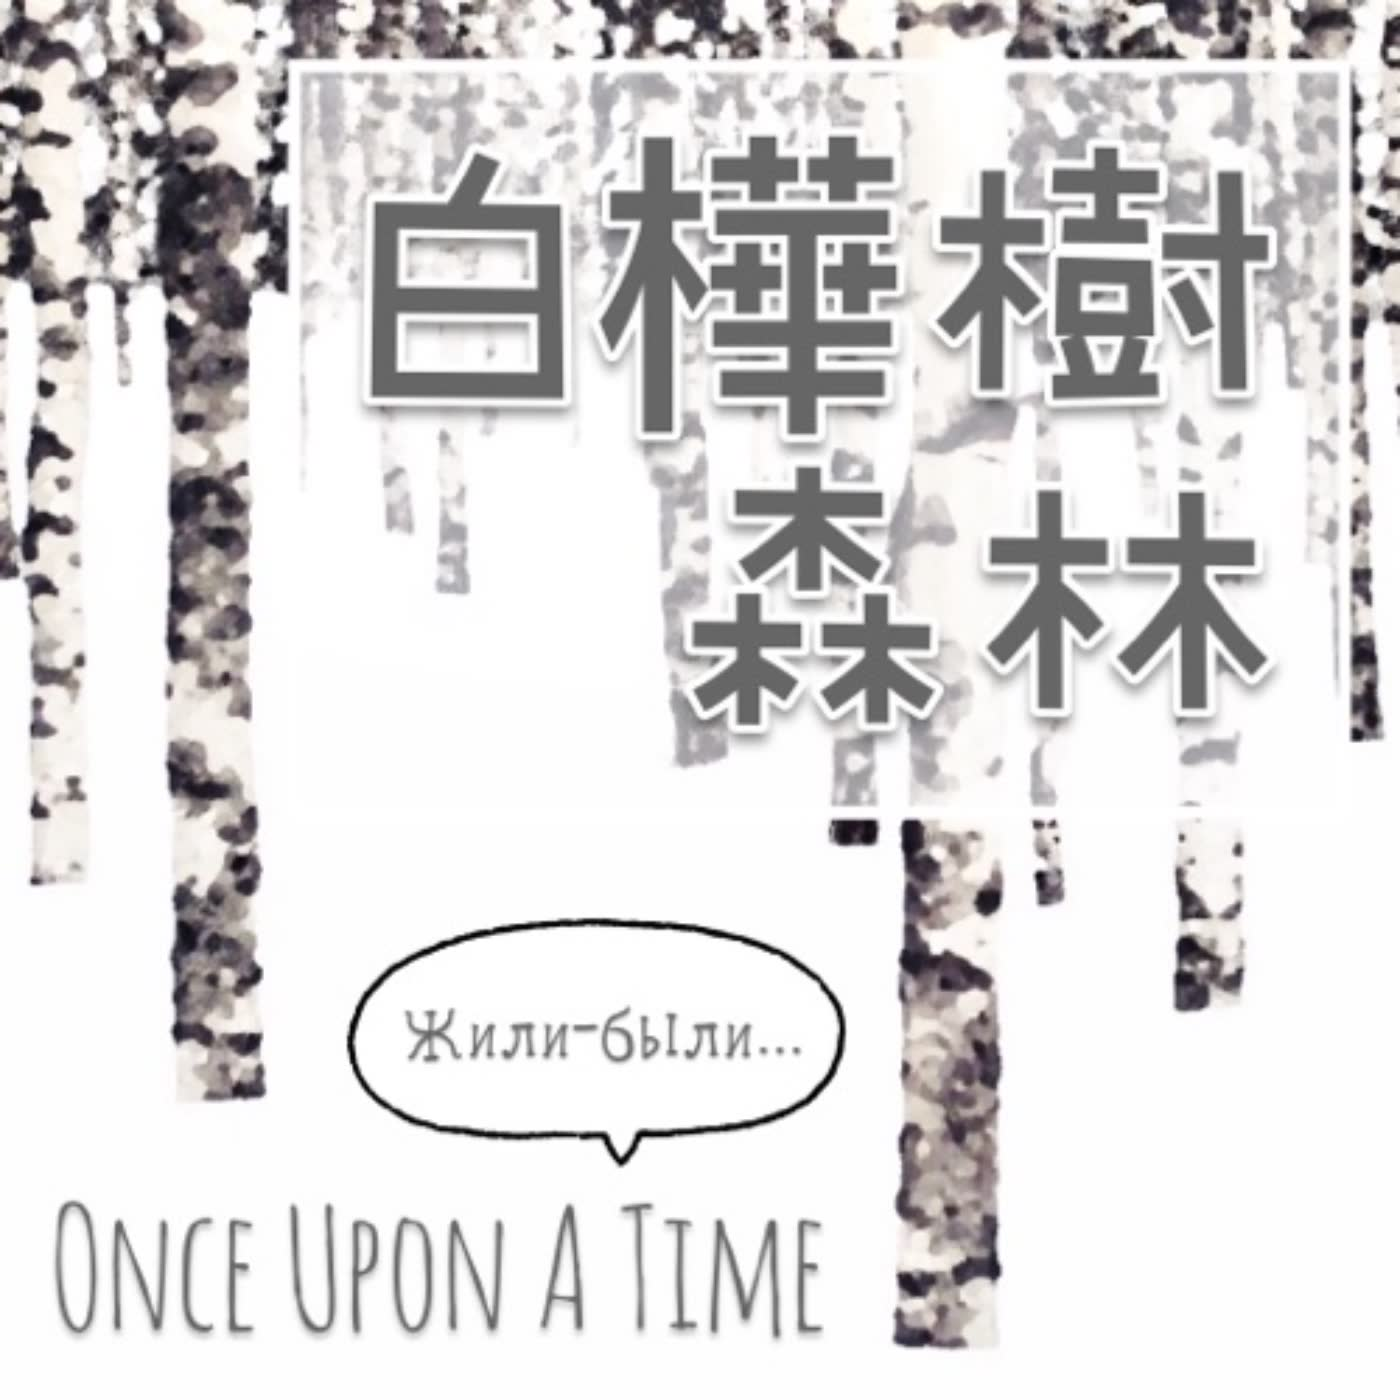 EP02|第二棵樹 - 漁夫與金魚 Сказка о Рыбаке и Рыбке【俄羅斯童話】|白樺樹森林 Once Upon A Time